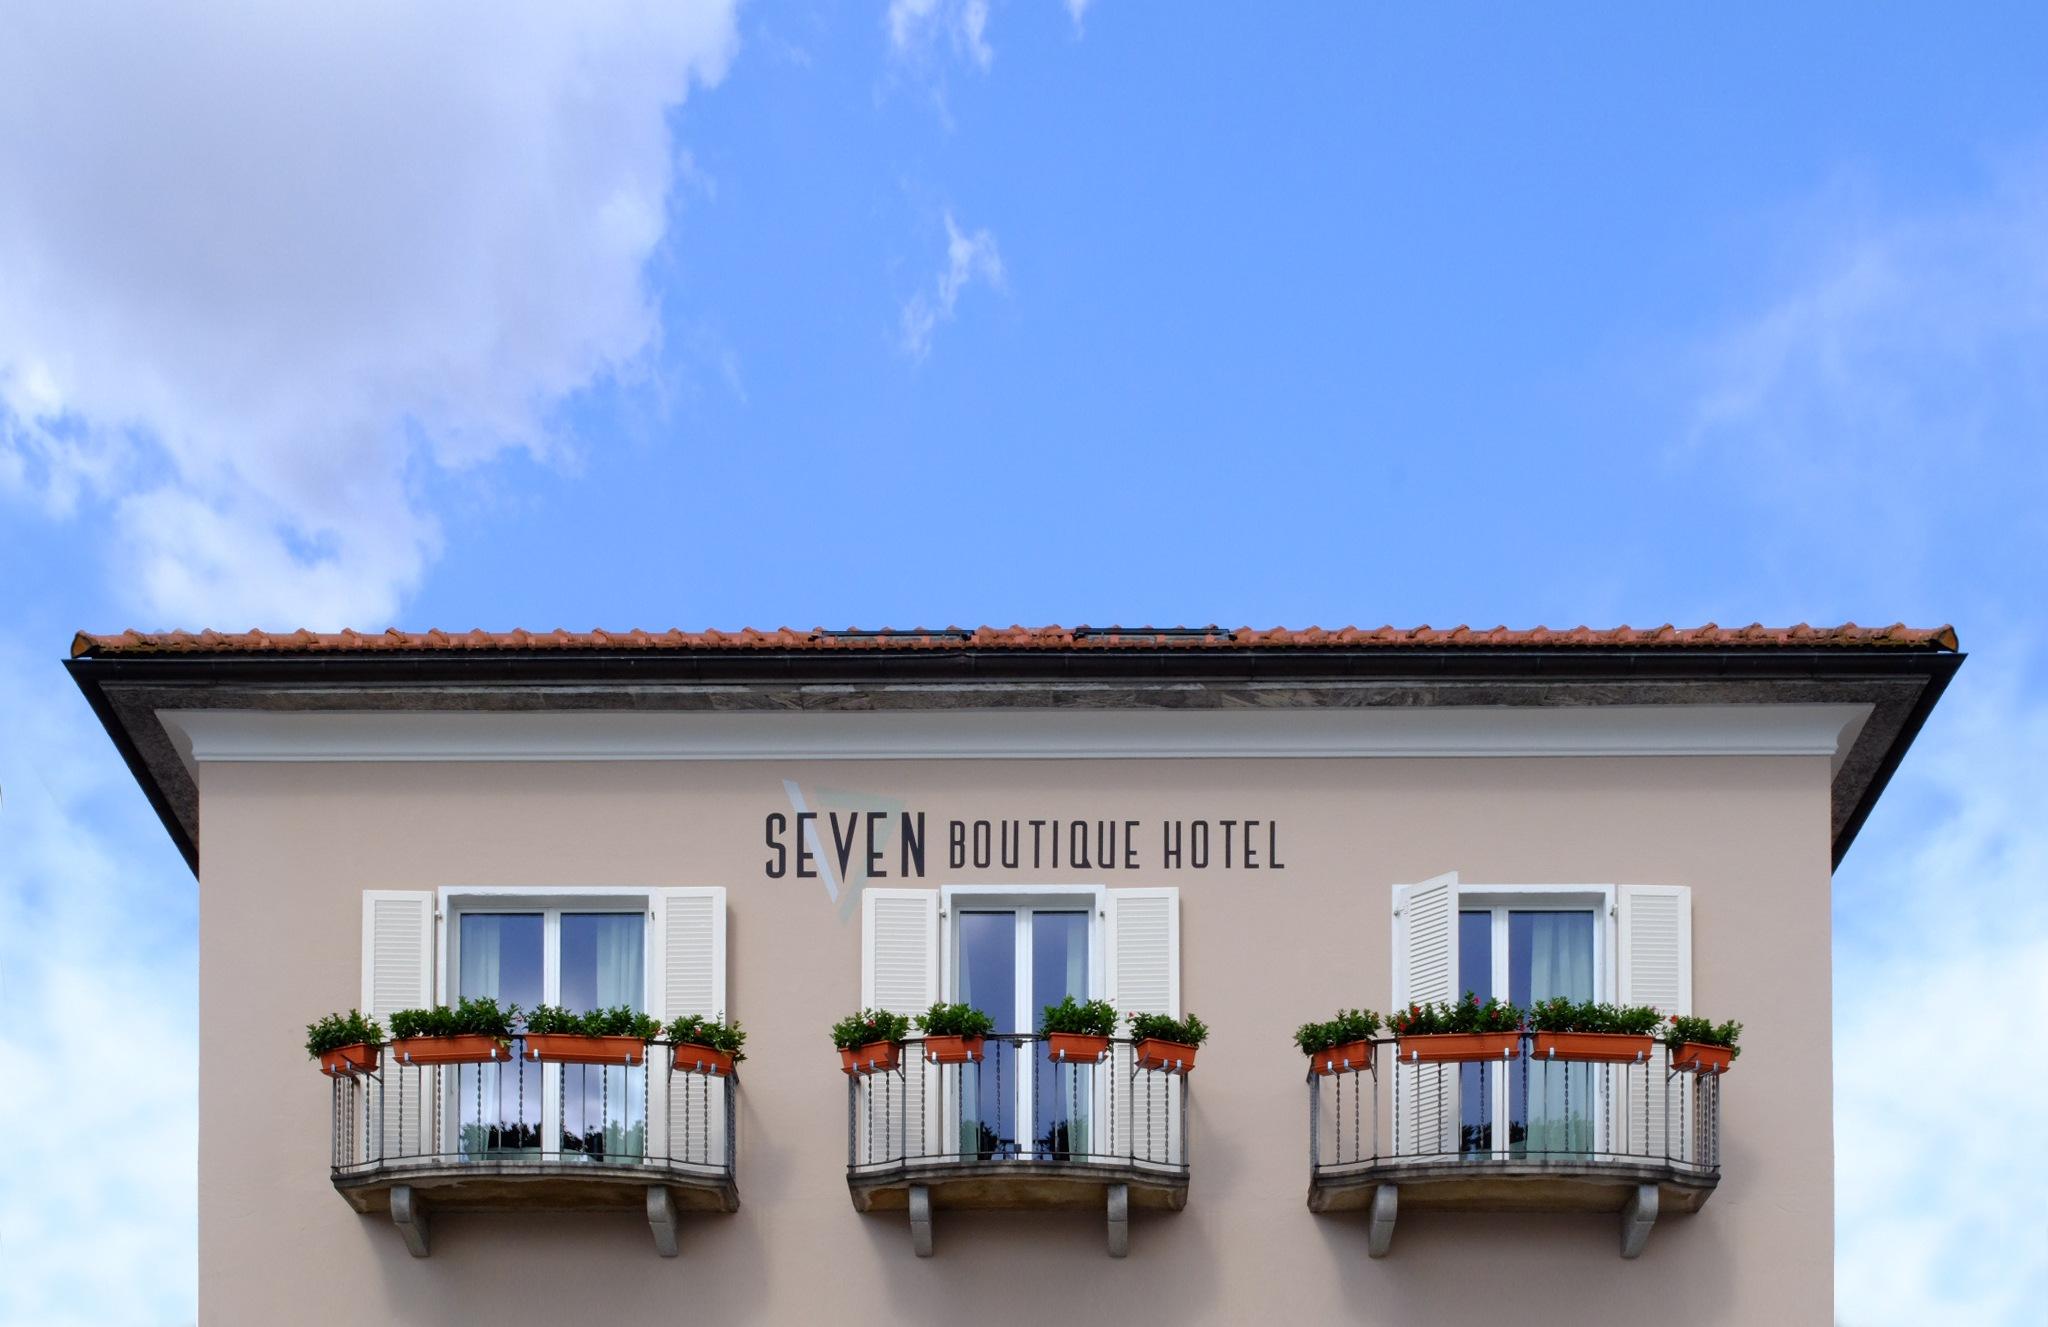 Seven Boutique Hotel, Ascona. CH by lokomotivarchs